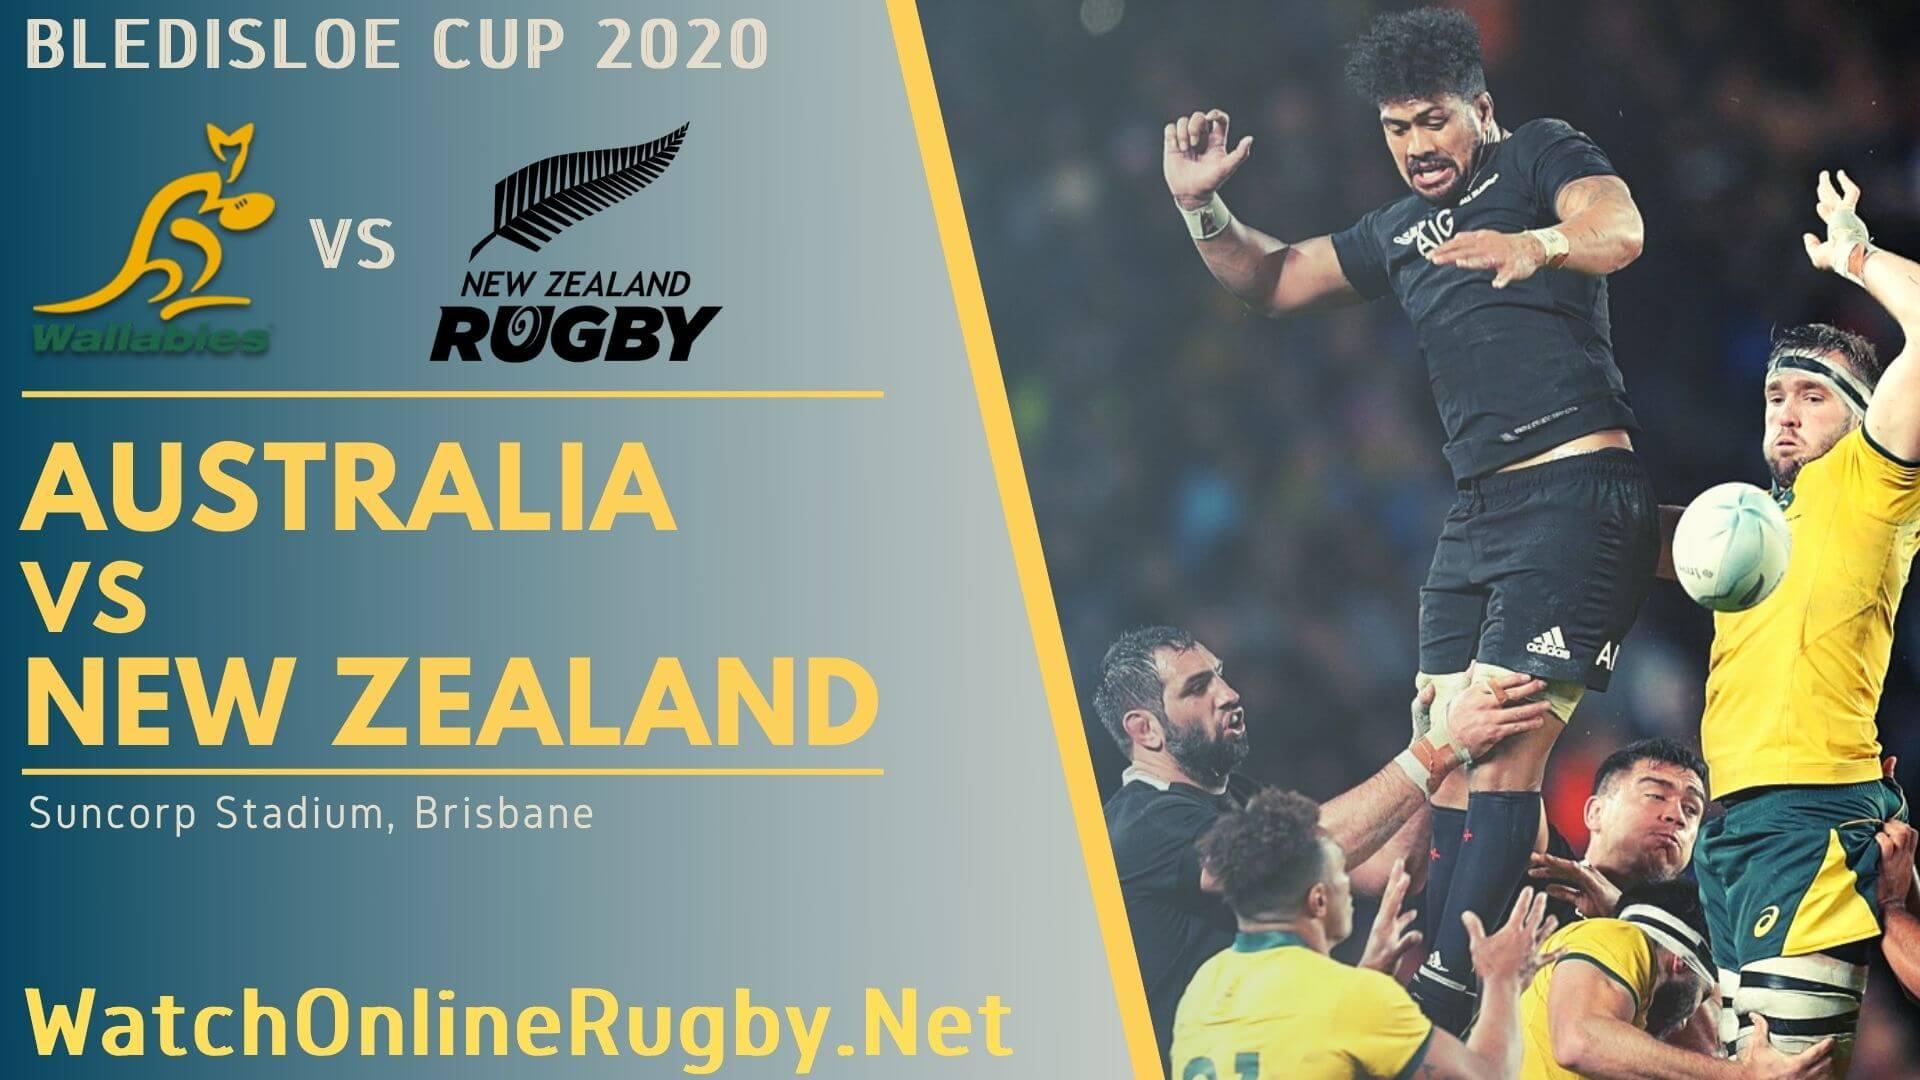 2016 Australia vs New Zealand Rugby Match Live